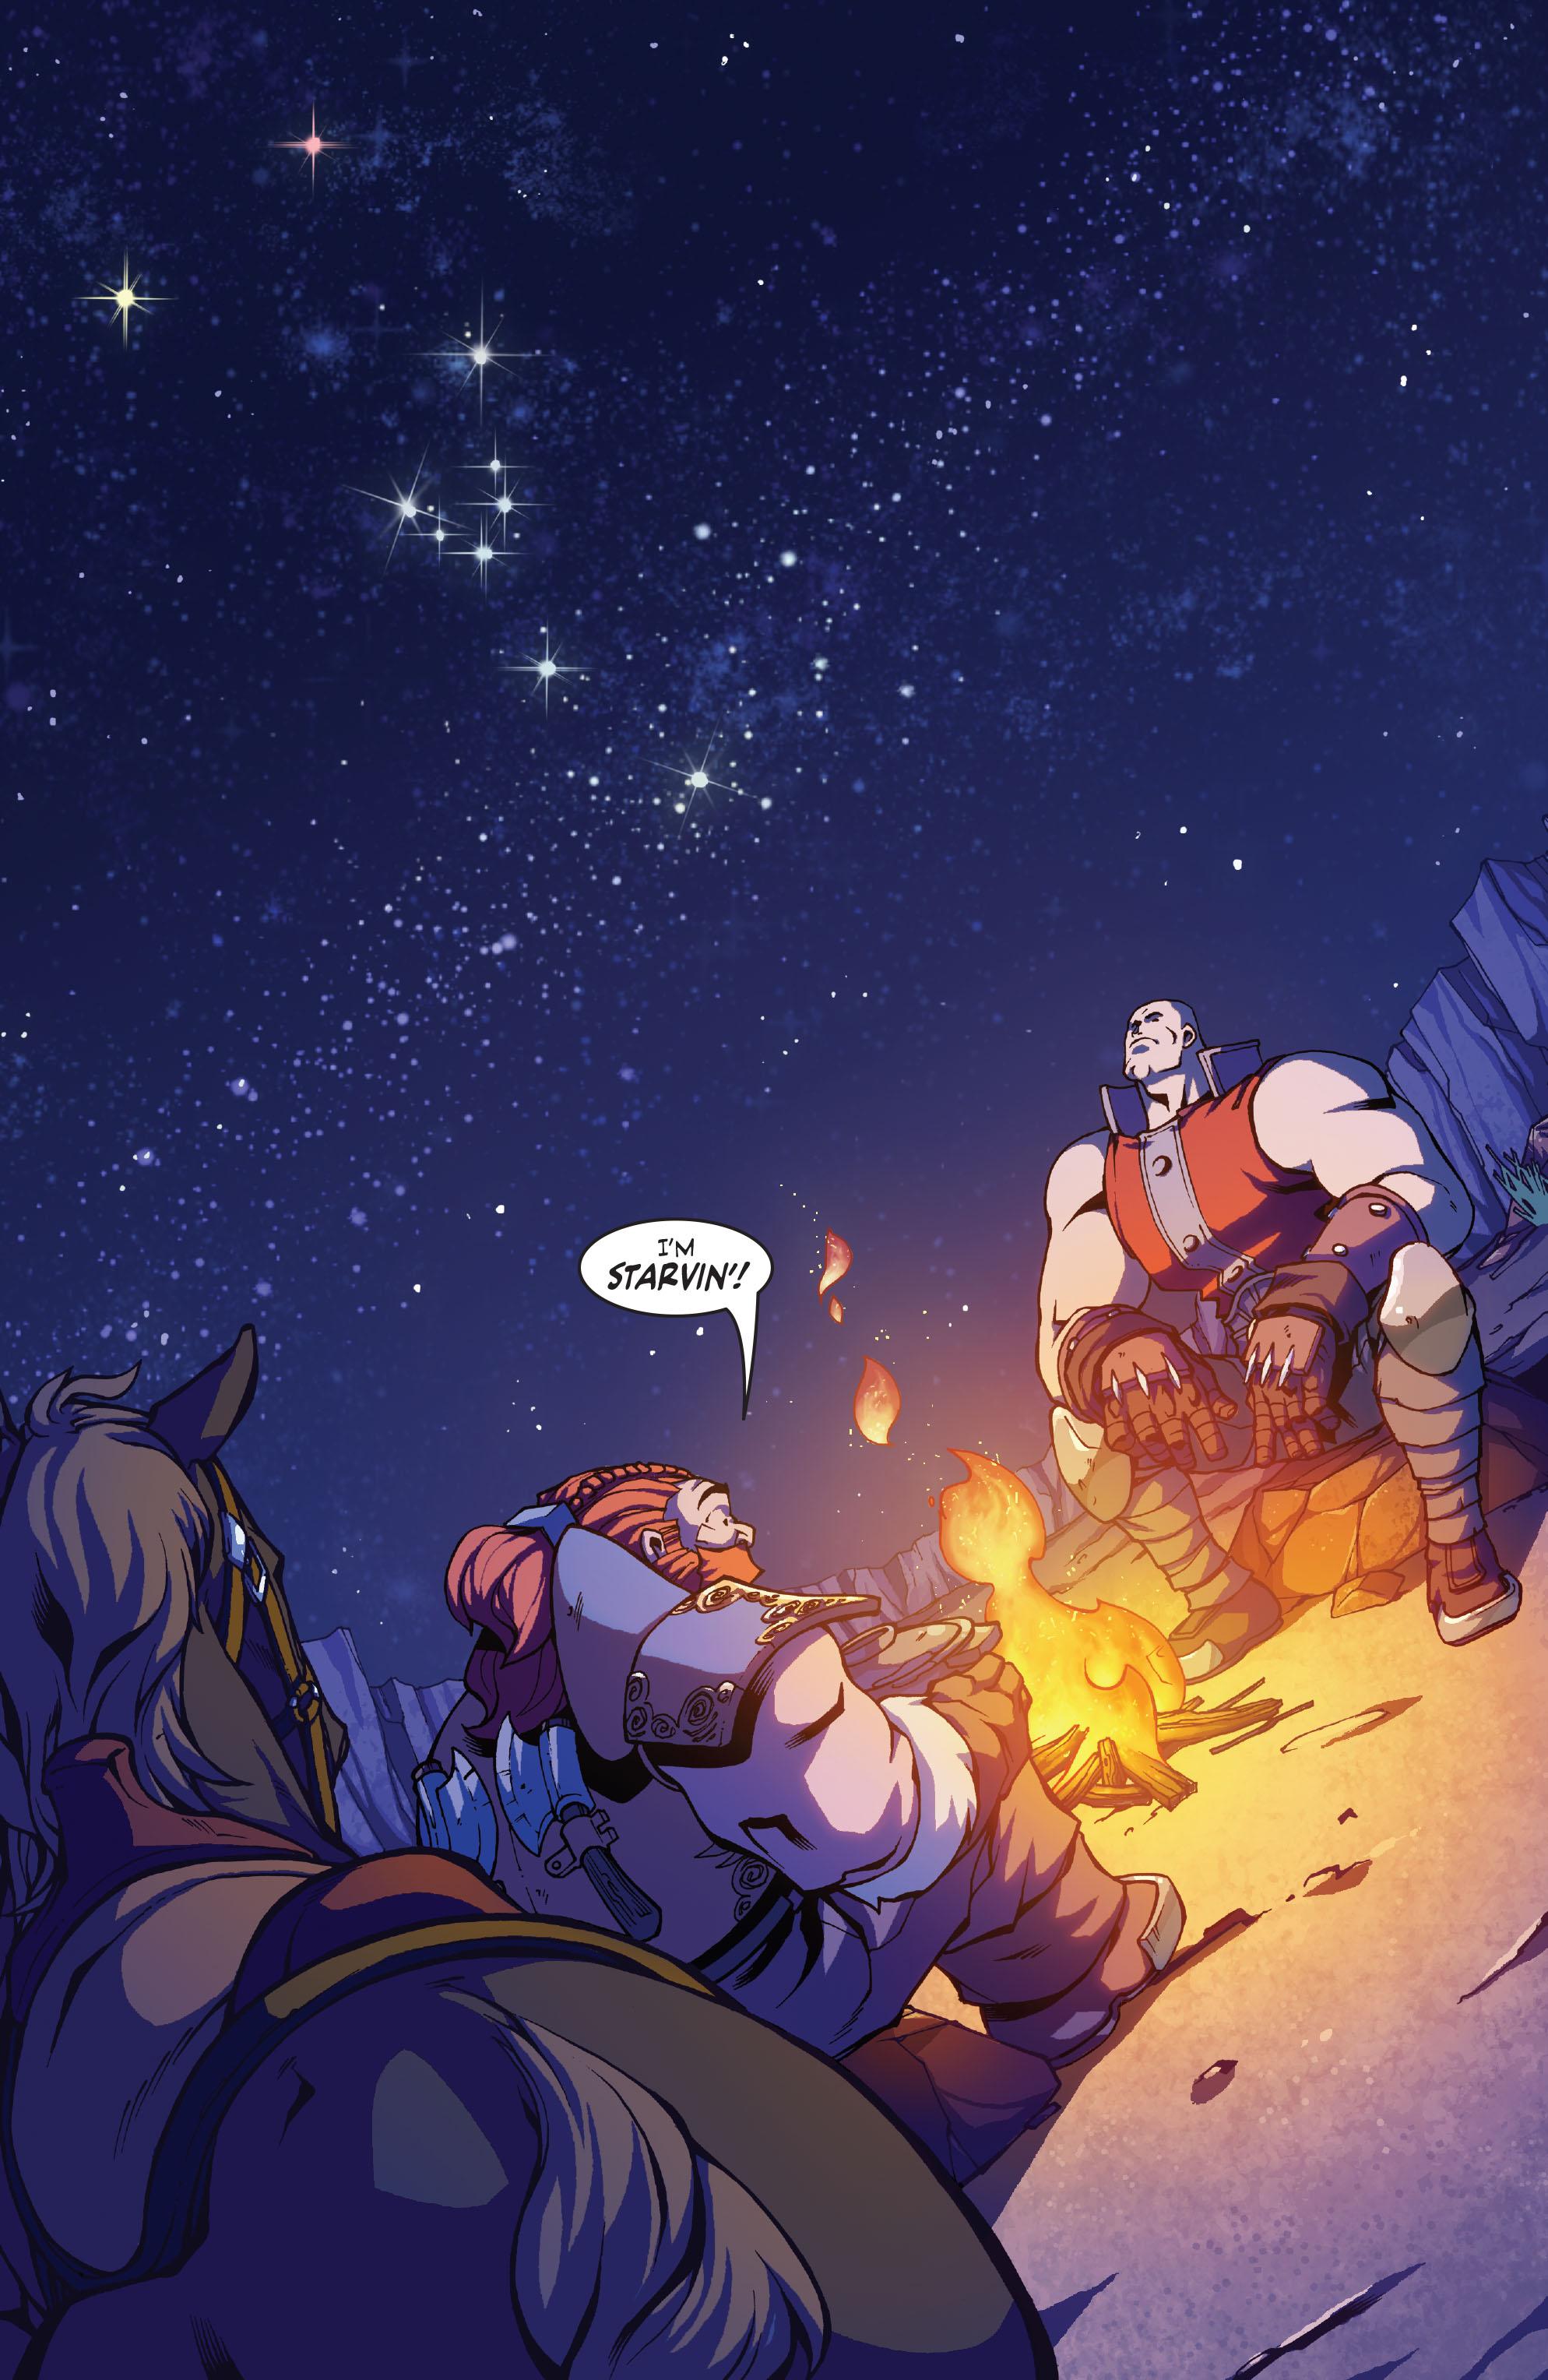 Read online Skullkickers comic -  Issue #3 - 3